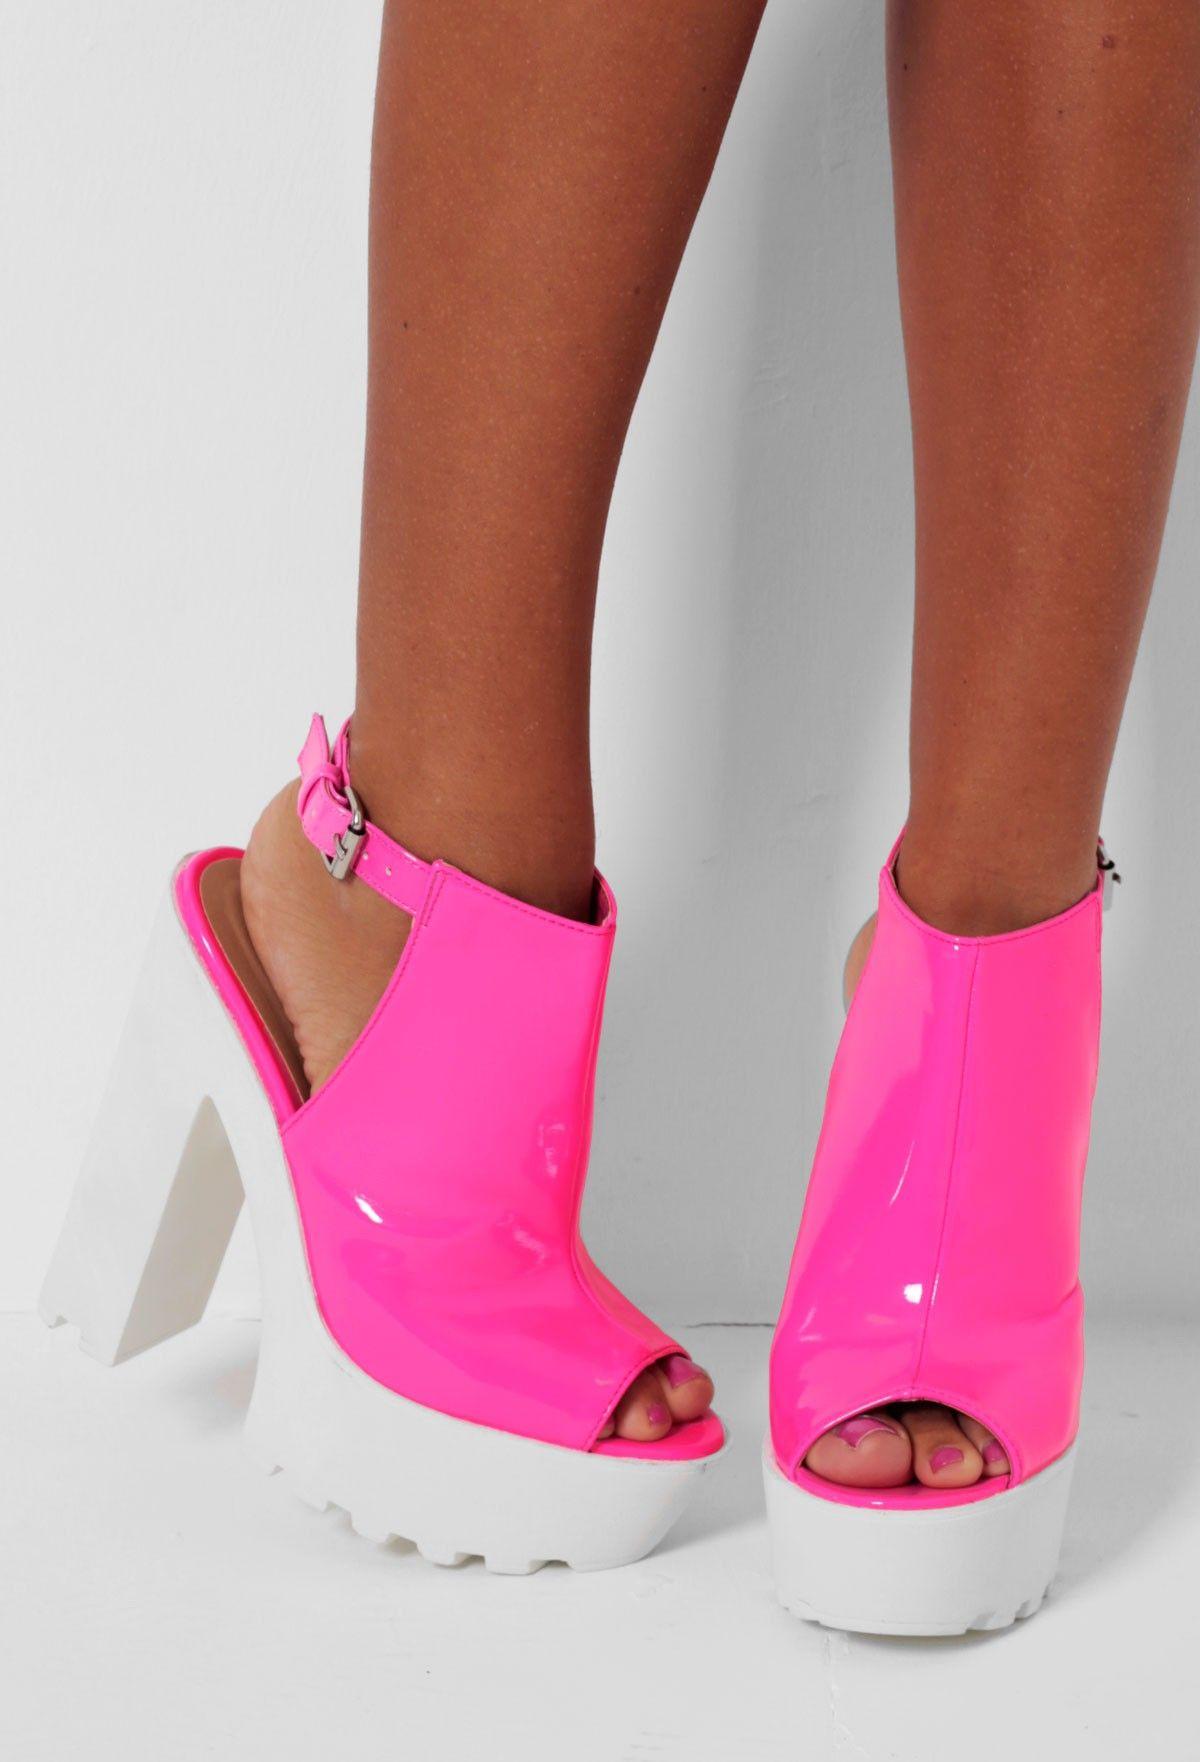 Skittles Pink Slingback Tractor Sole Platform Shoes | Pink ...